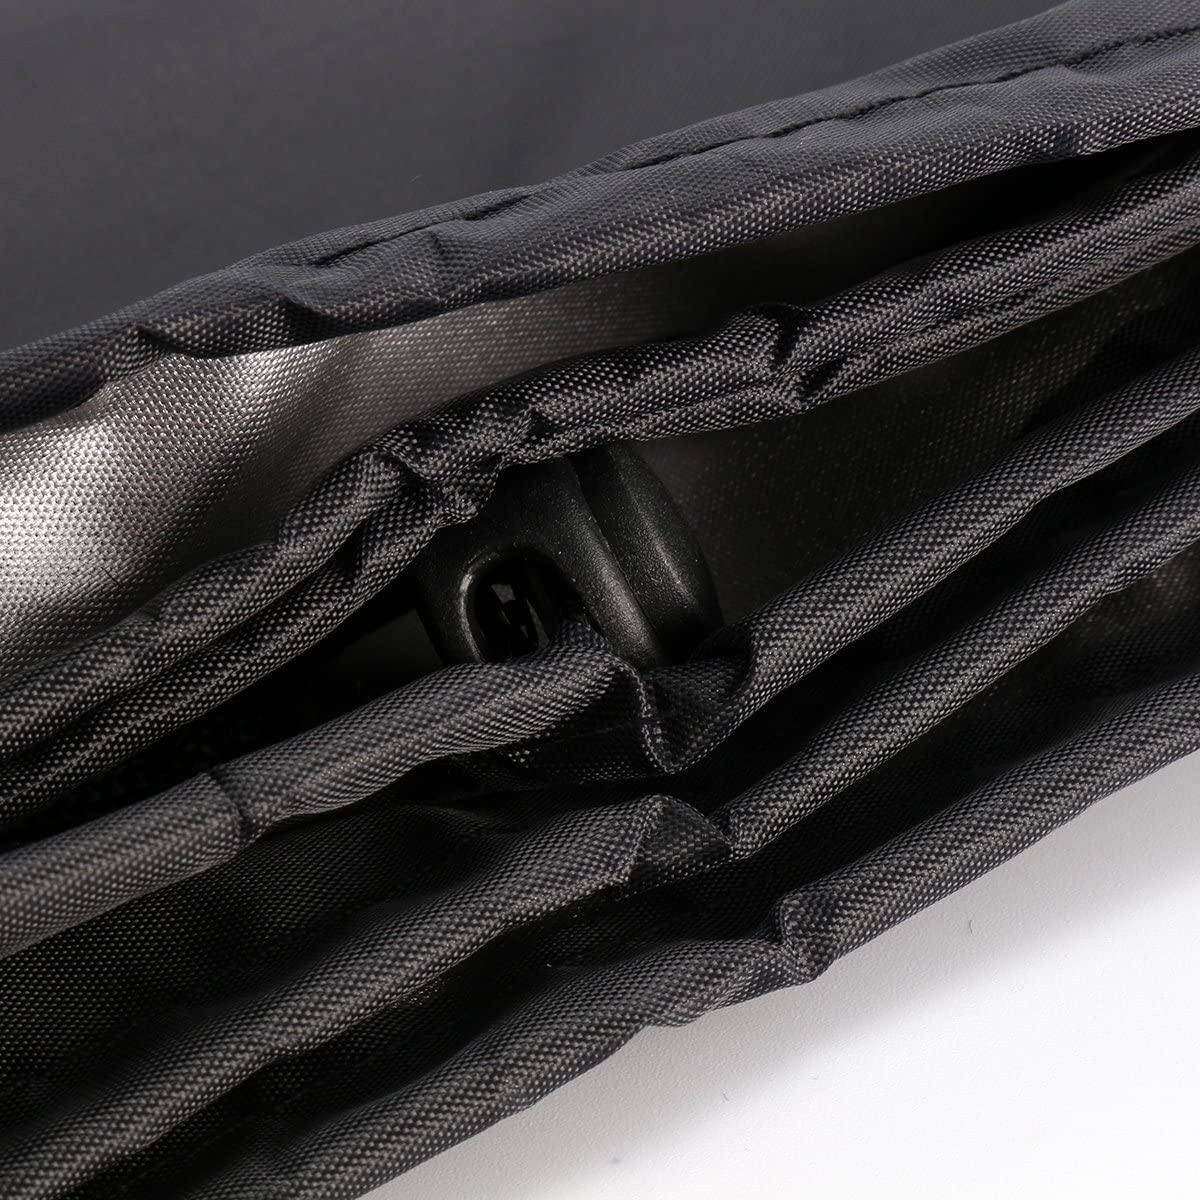 30Cm Black Polyester-Cotton Blend Printer Dust Cover ExcLent 50 40